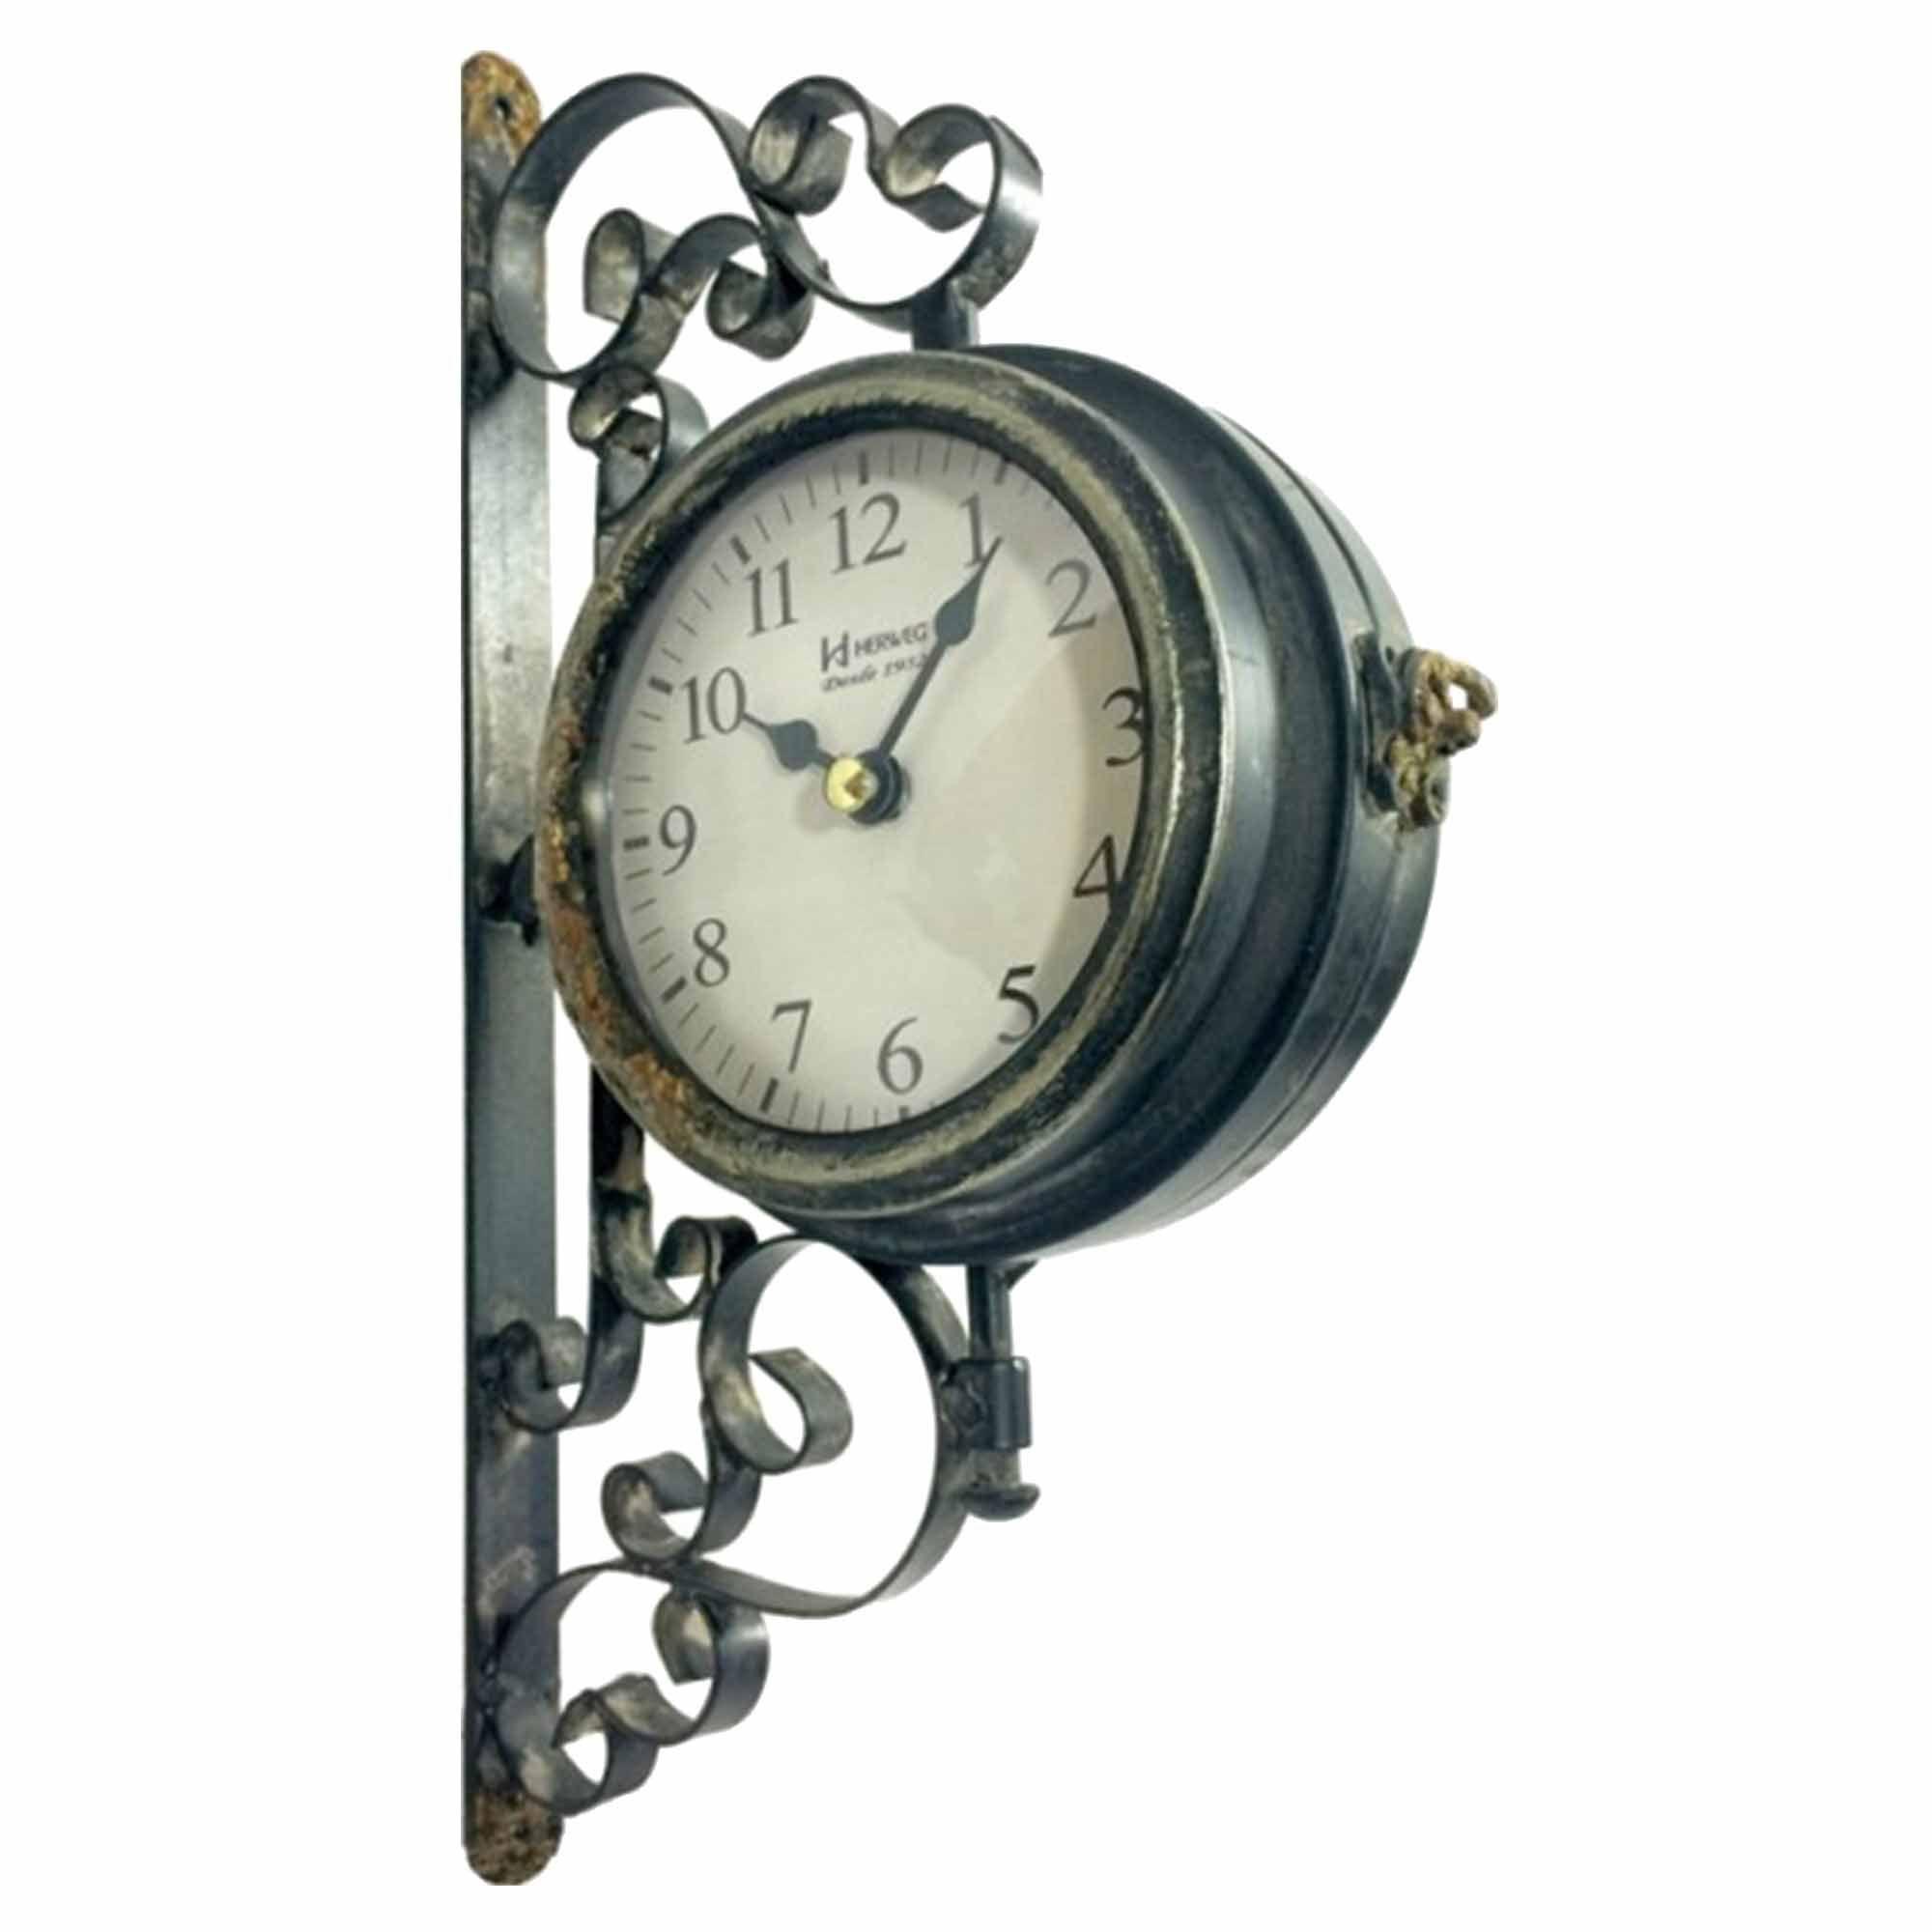 Relógio de Parede Jardim Herweg 6476 999 Natural